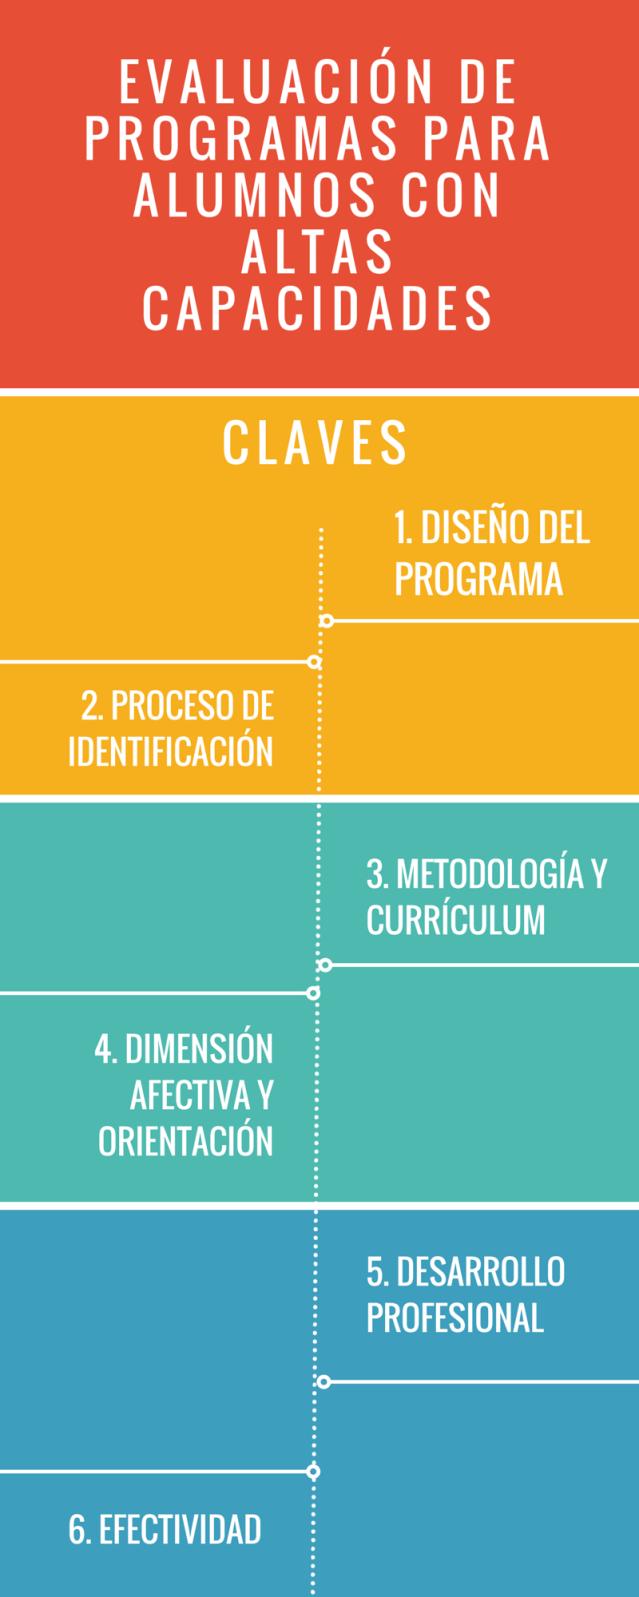 evaluación programas altas capacidades